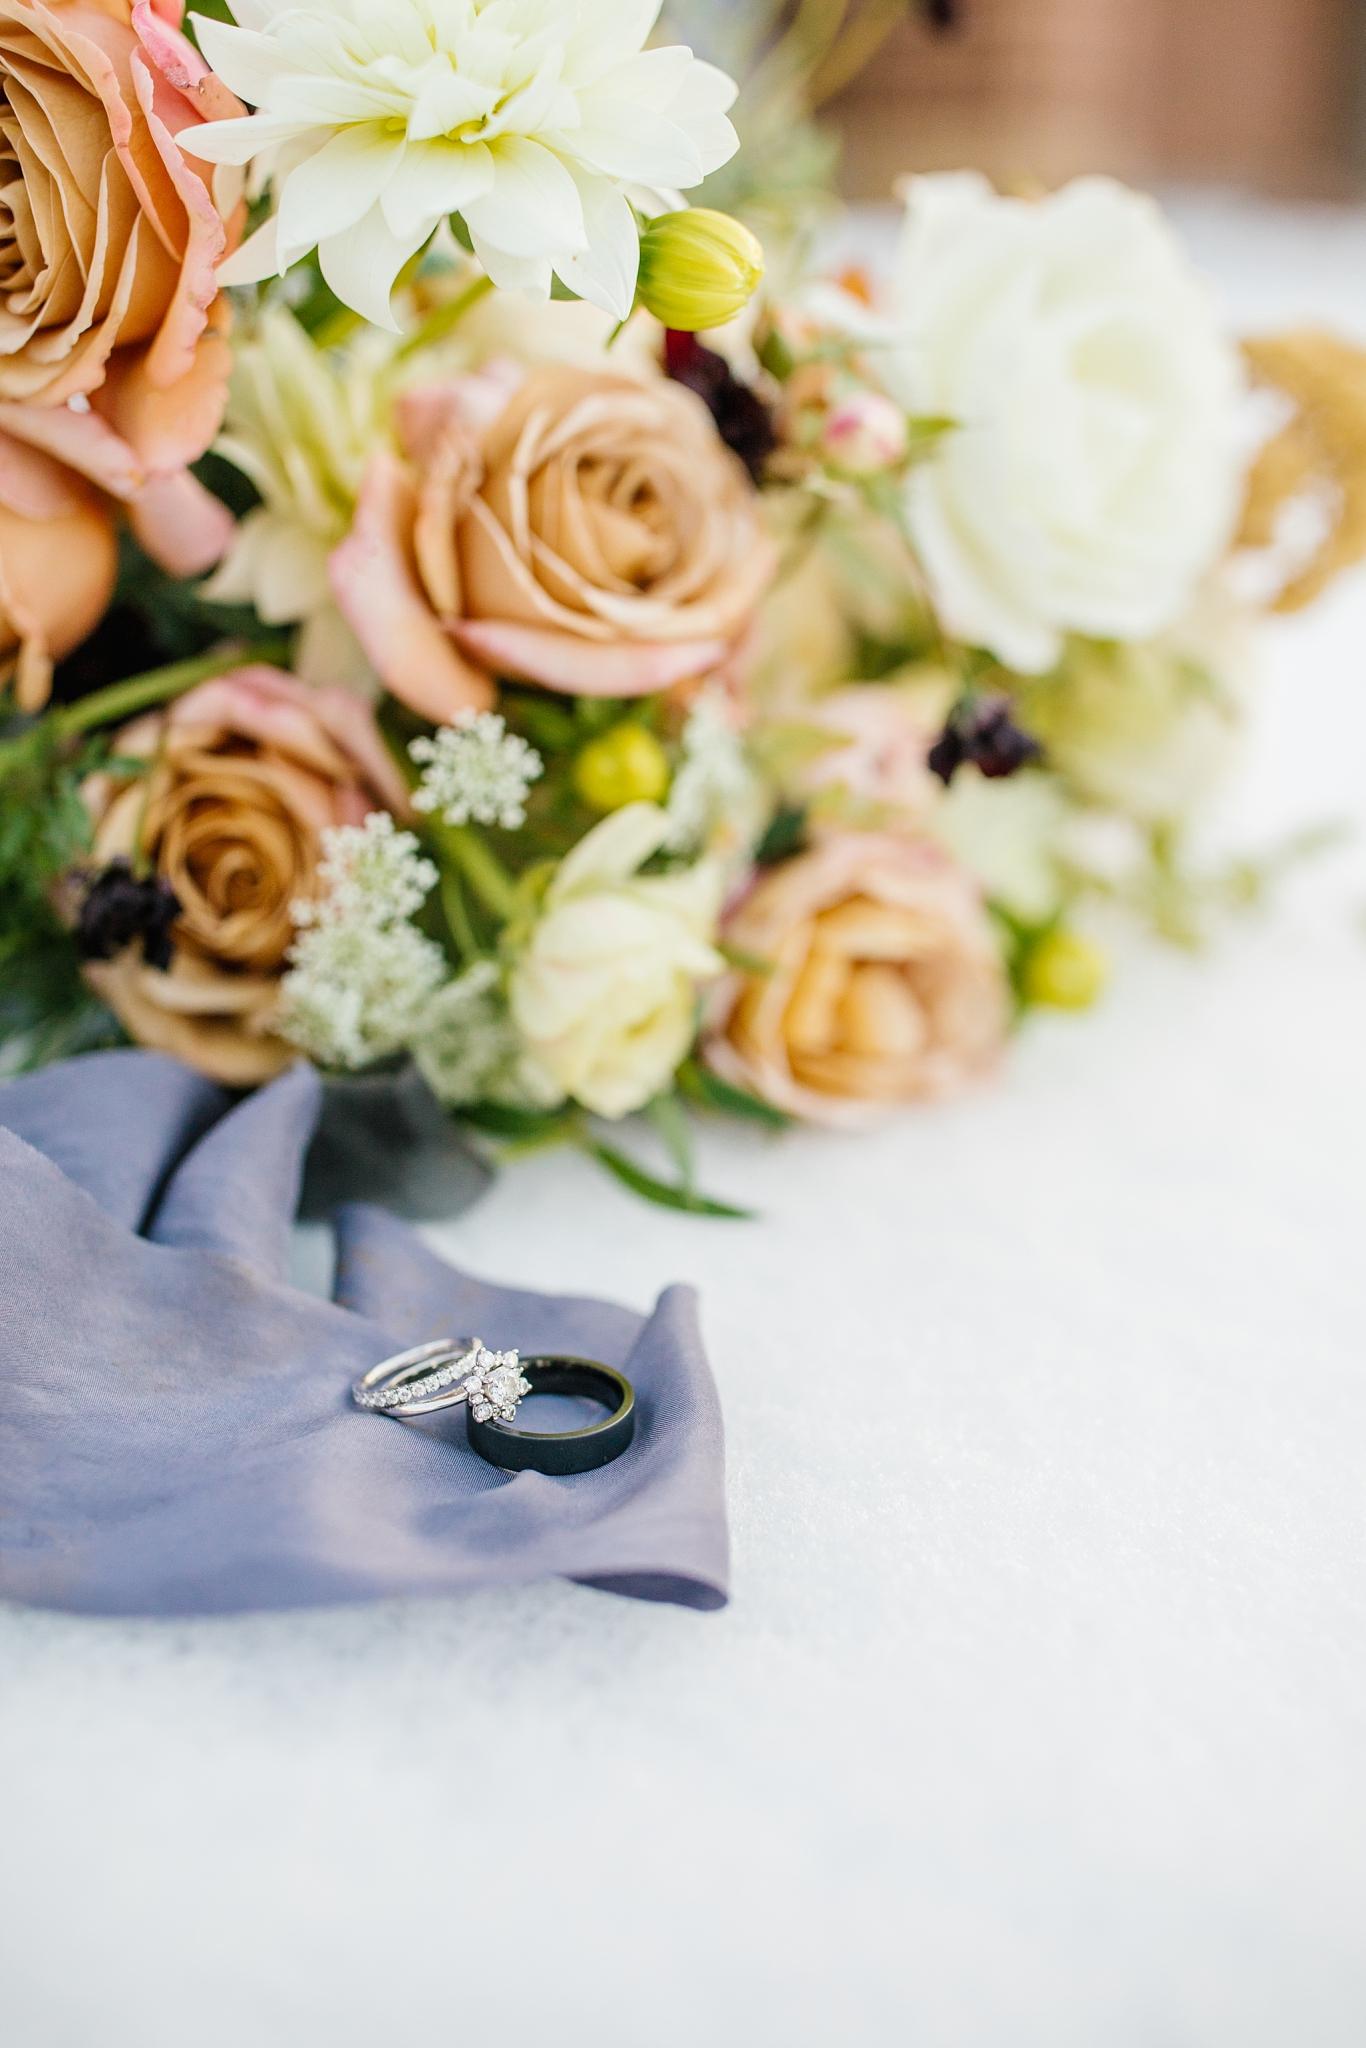 CN-Wedding-315_Lizzie-B-Imagery-Utah-Wedding-Photographer-Blessed-Sacrament-Catholic-Church-Sandy-Utah-The-Blended-Table-Salt-Lake-City.jpg